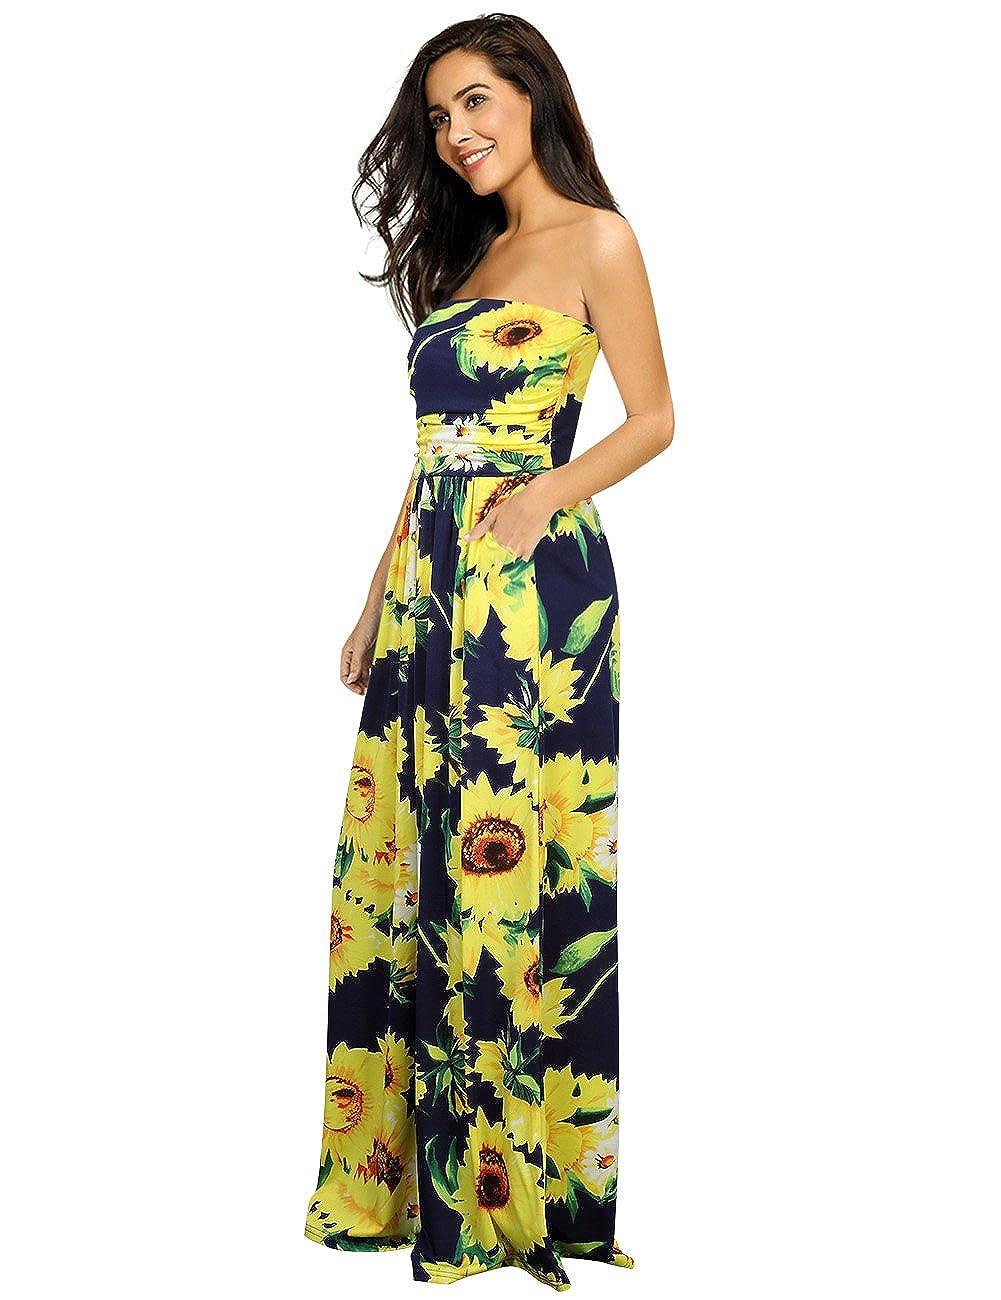 beb03f61601b1 Leadingstar Women's Floral Casual Beach Party Maxi Dress